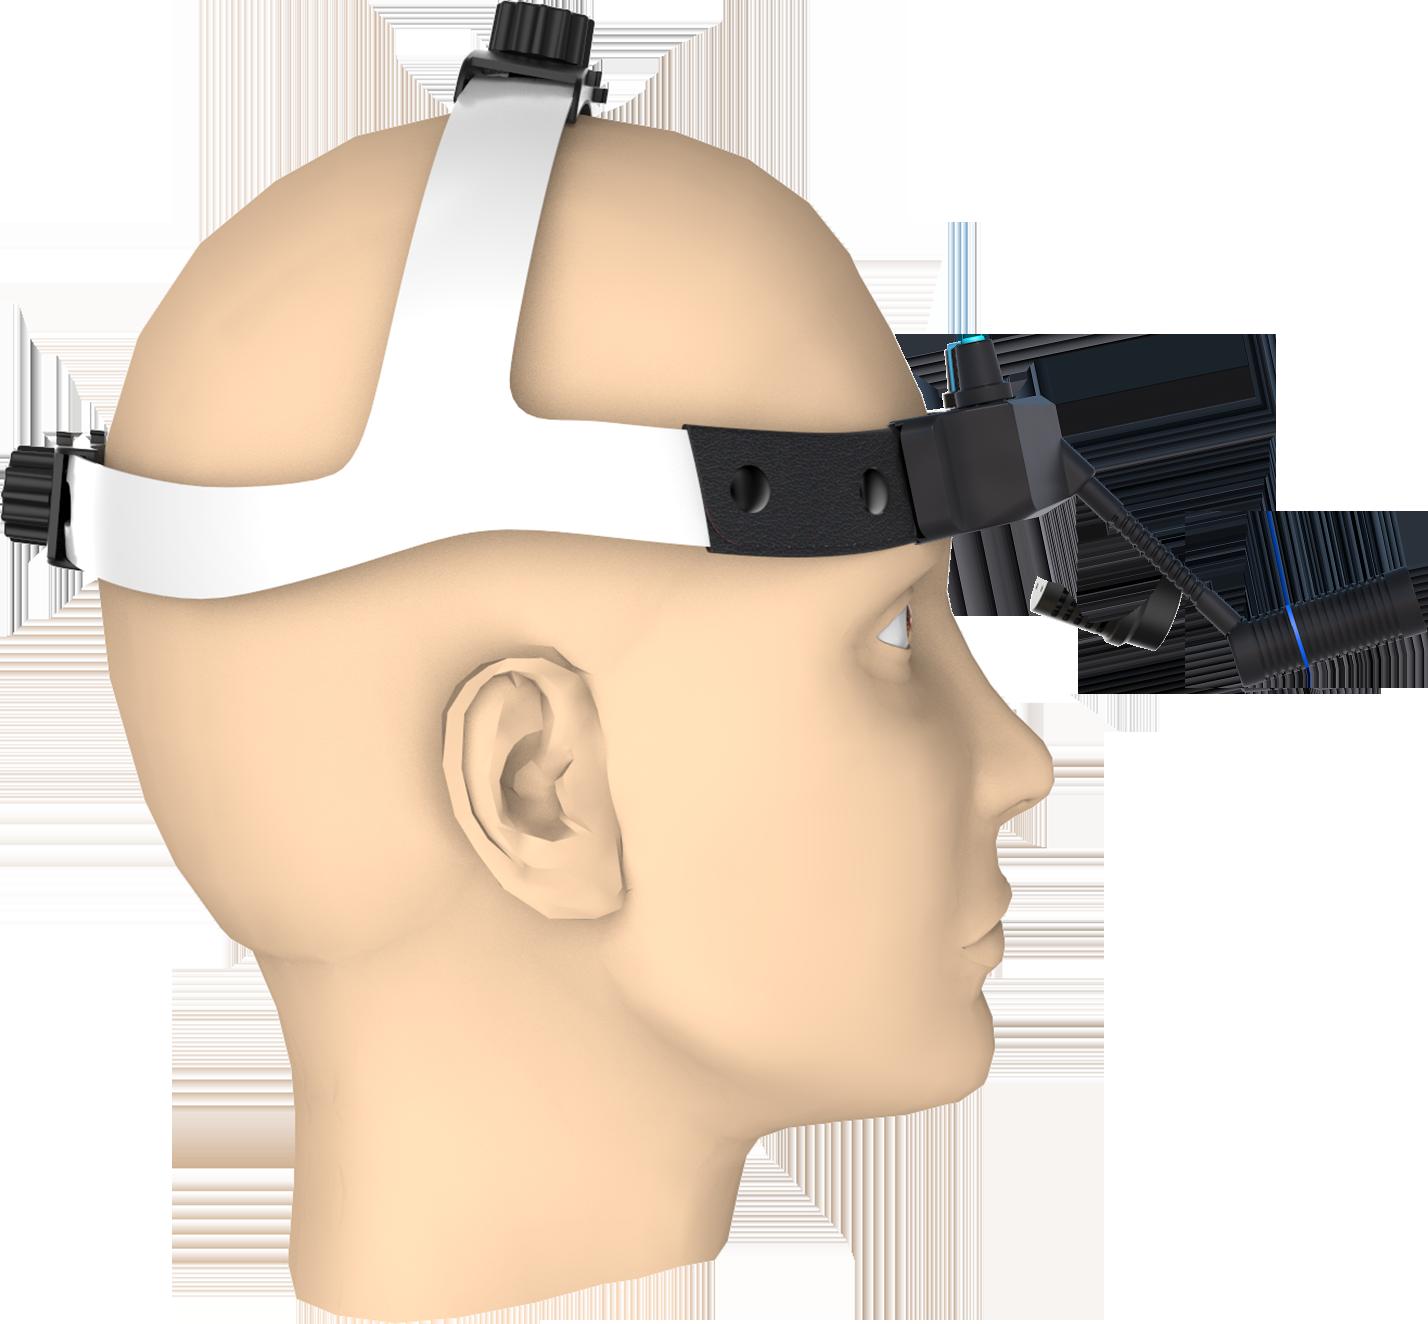 360 Degrees Ajustable Rechargeable High Intensity 3W ENT Headlamp Dentistry Operation Helmet Lamp LED Headlight(TD-V08) enlarge